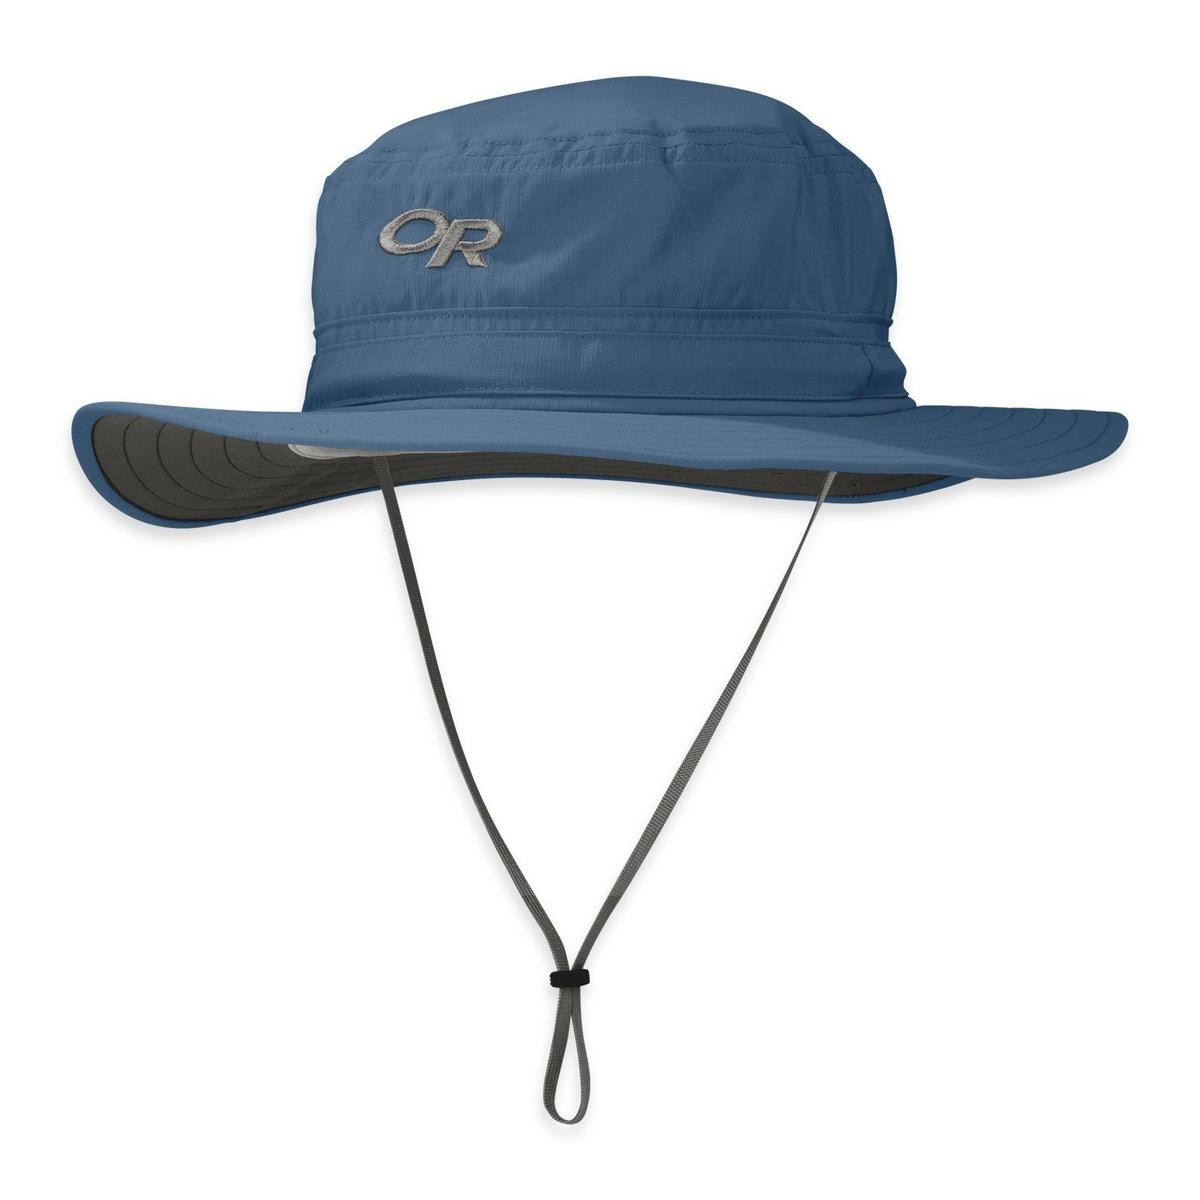 Outdoor Research Unisex Helios Sun Hat - Dusk